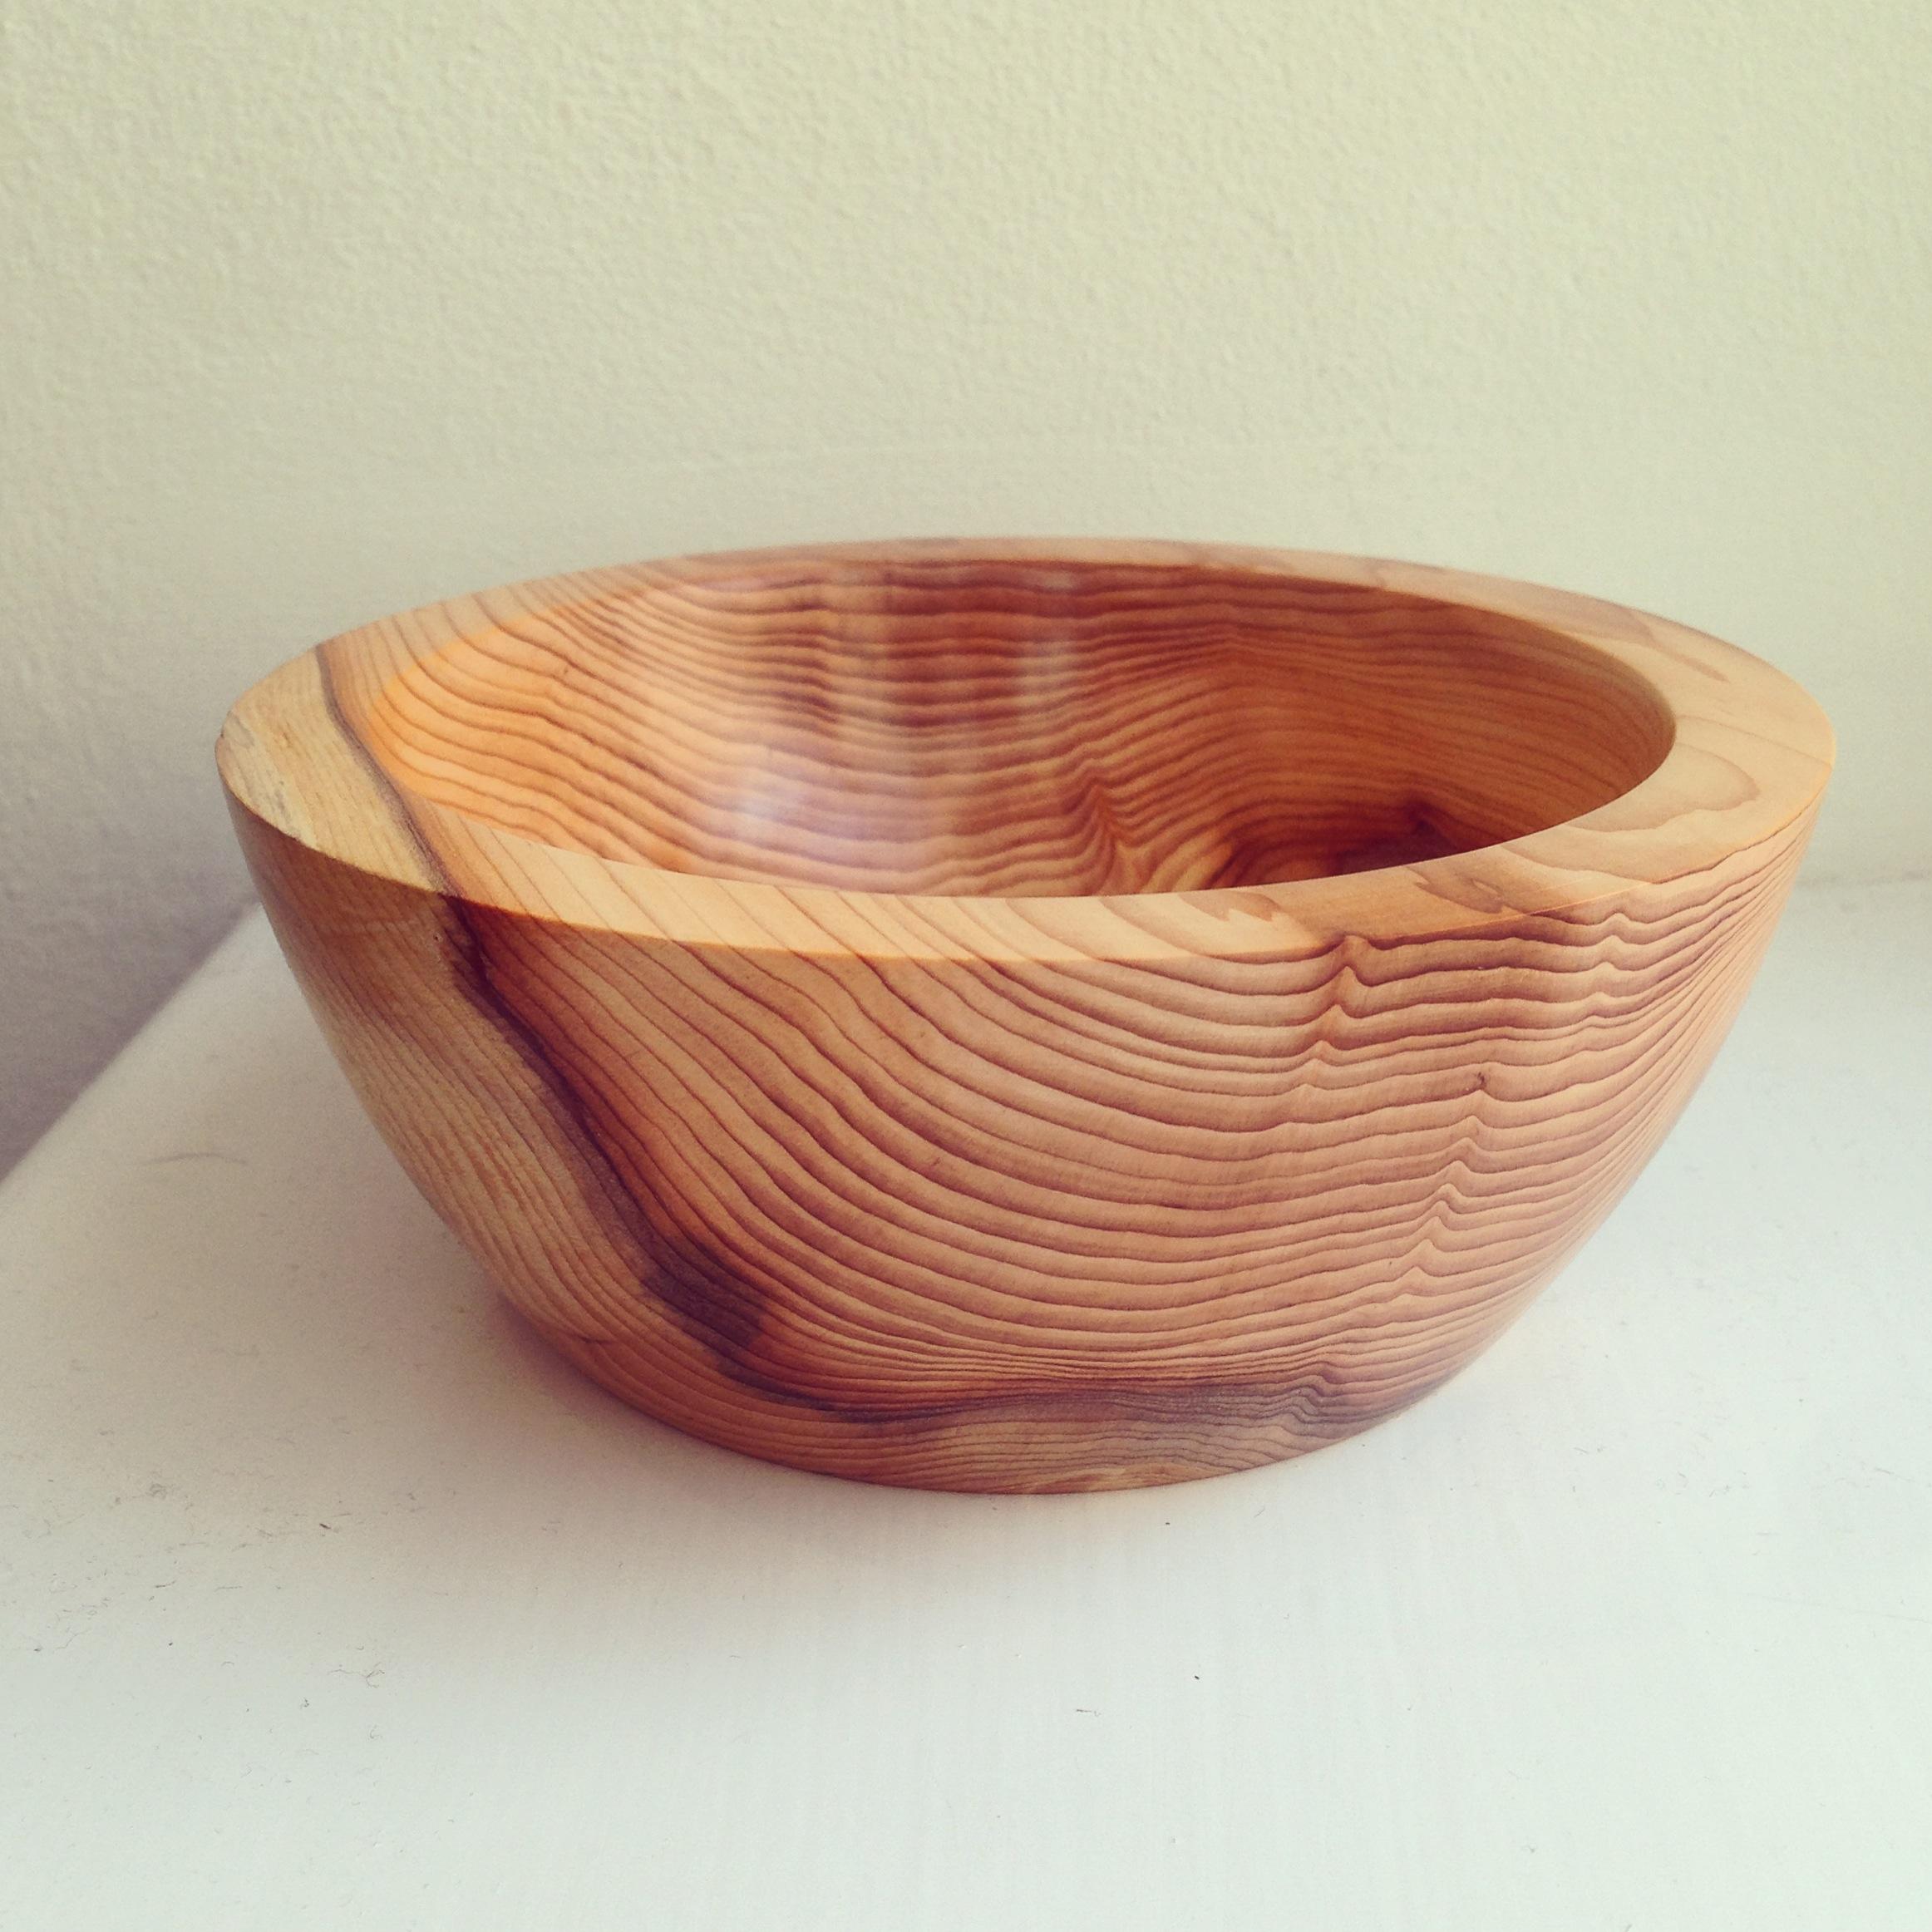 Bowl, Yew